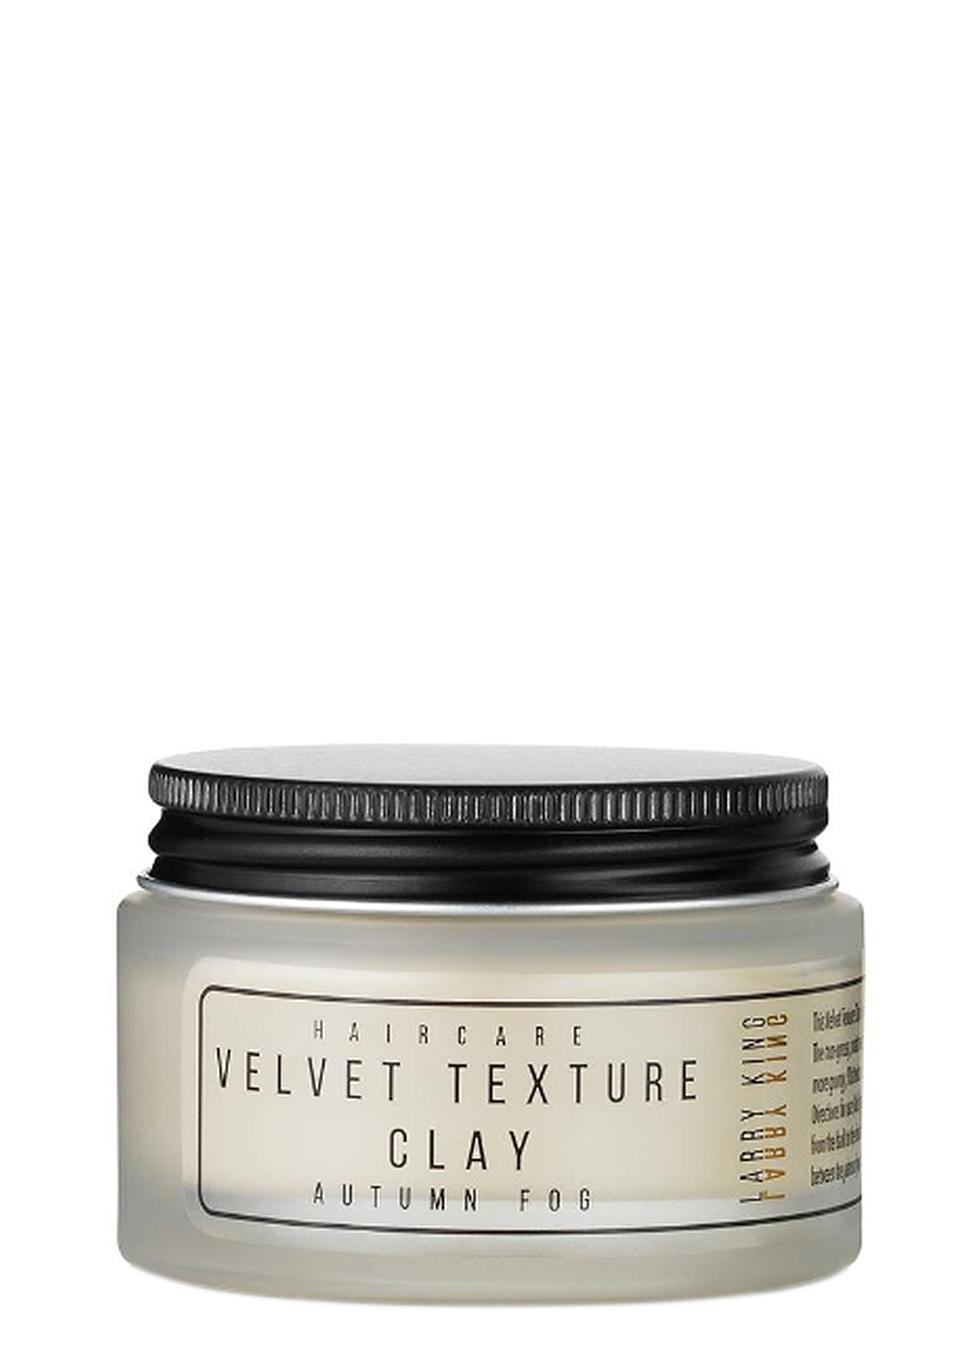 Velvet Texture Clay 50g